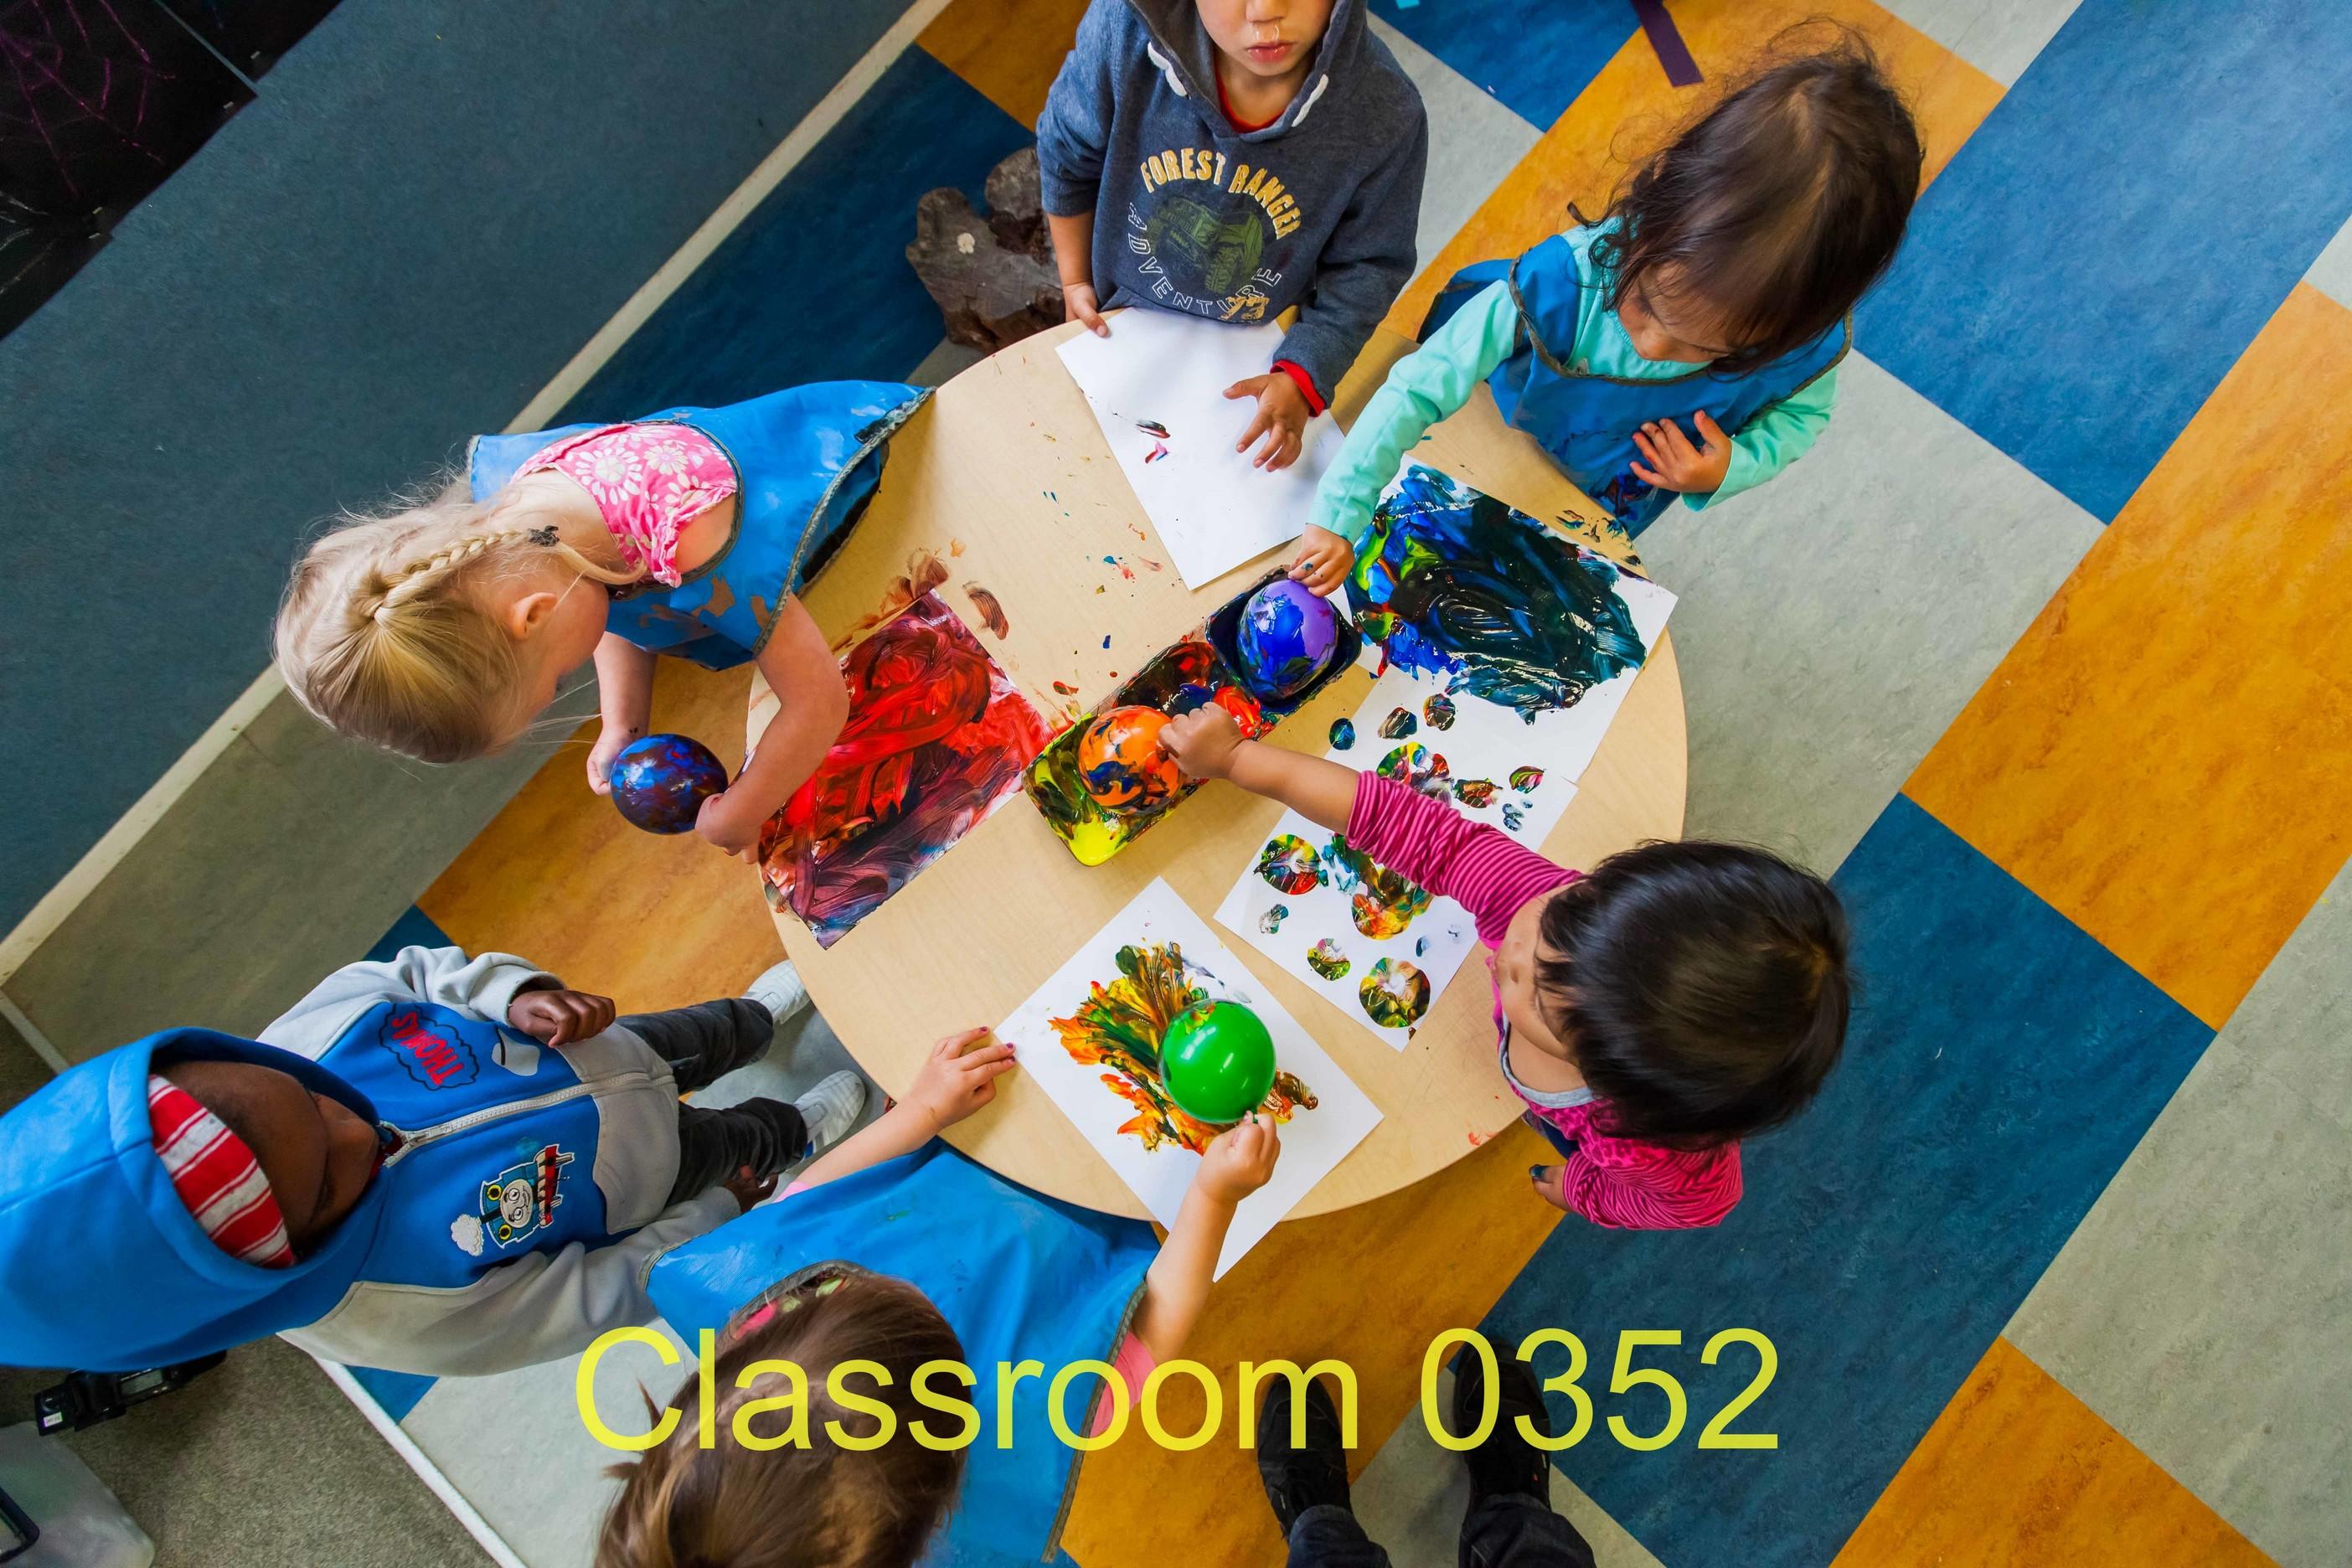 Classroom 0352